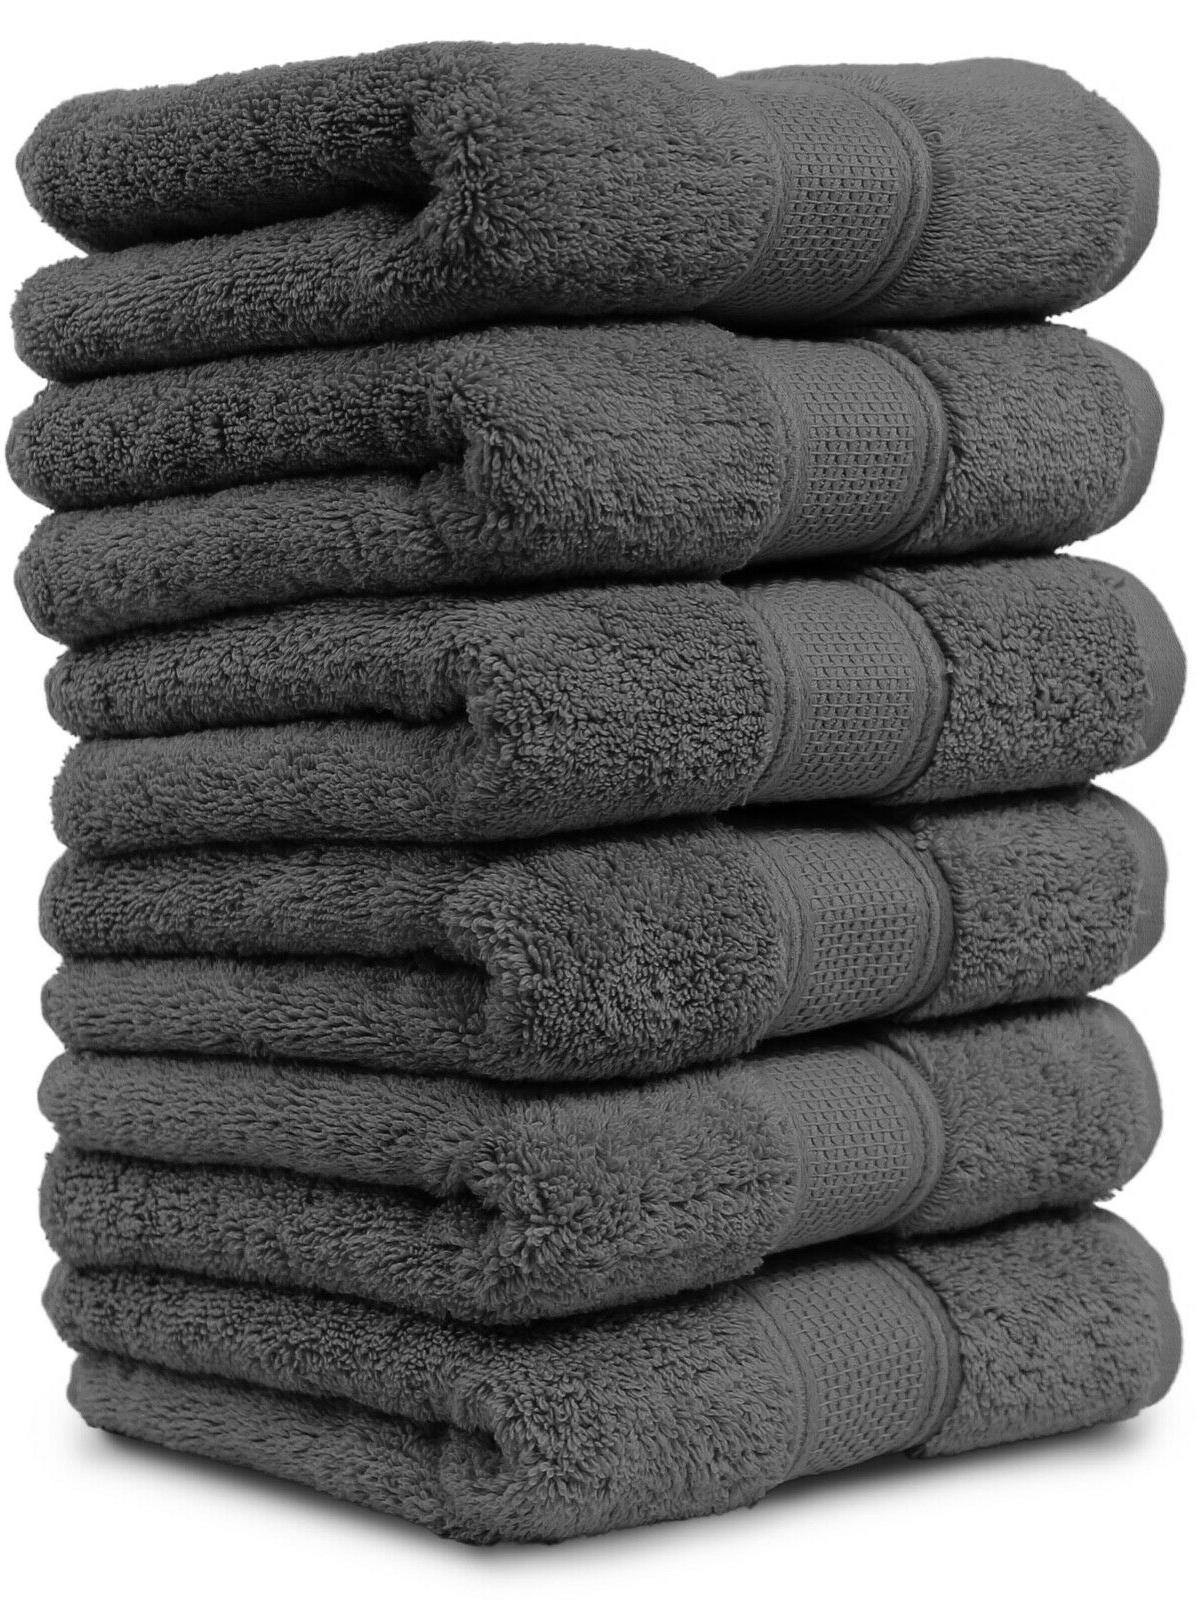 new cotton hand towels set large 16x30